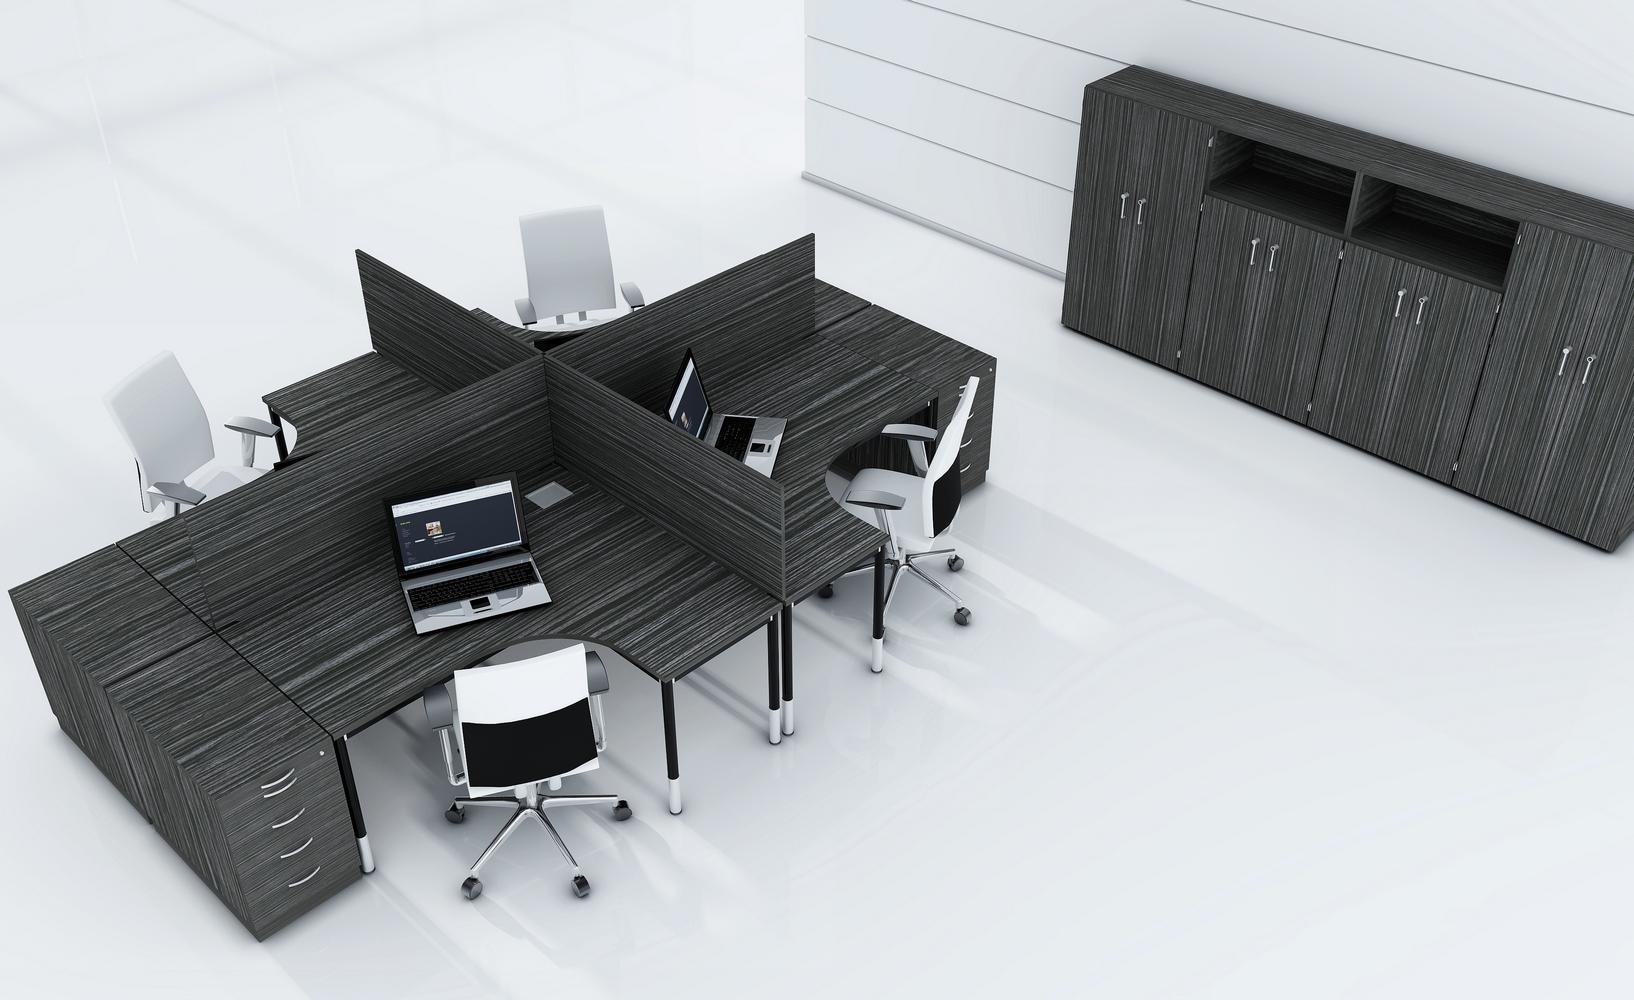 podwójne biurka pracownicze G4-02tuari